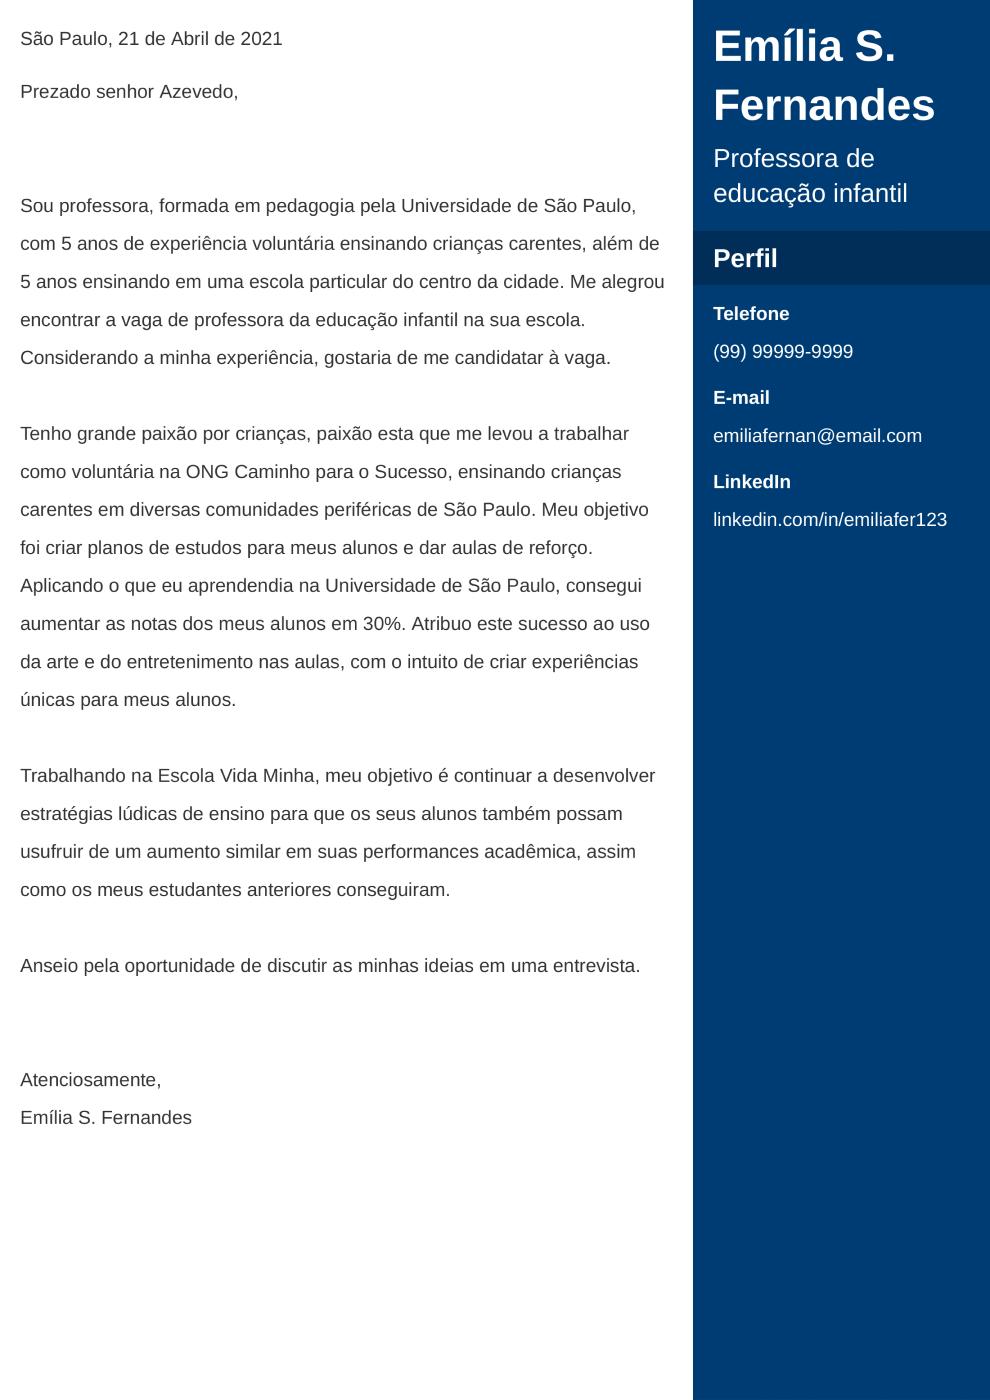 Exemplo de carta de apresentacao: Enfold